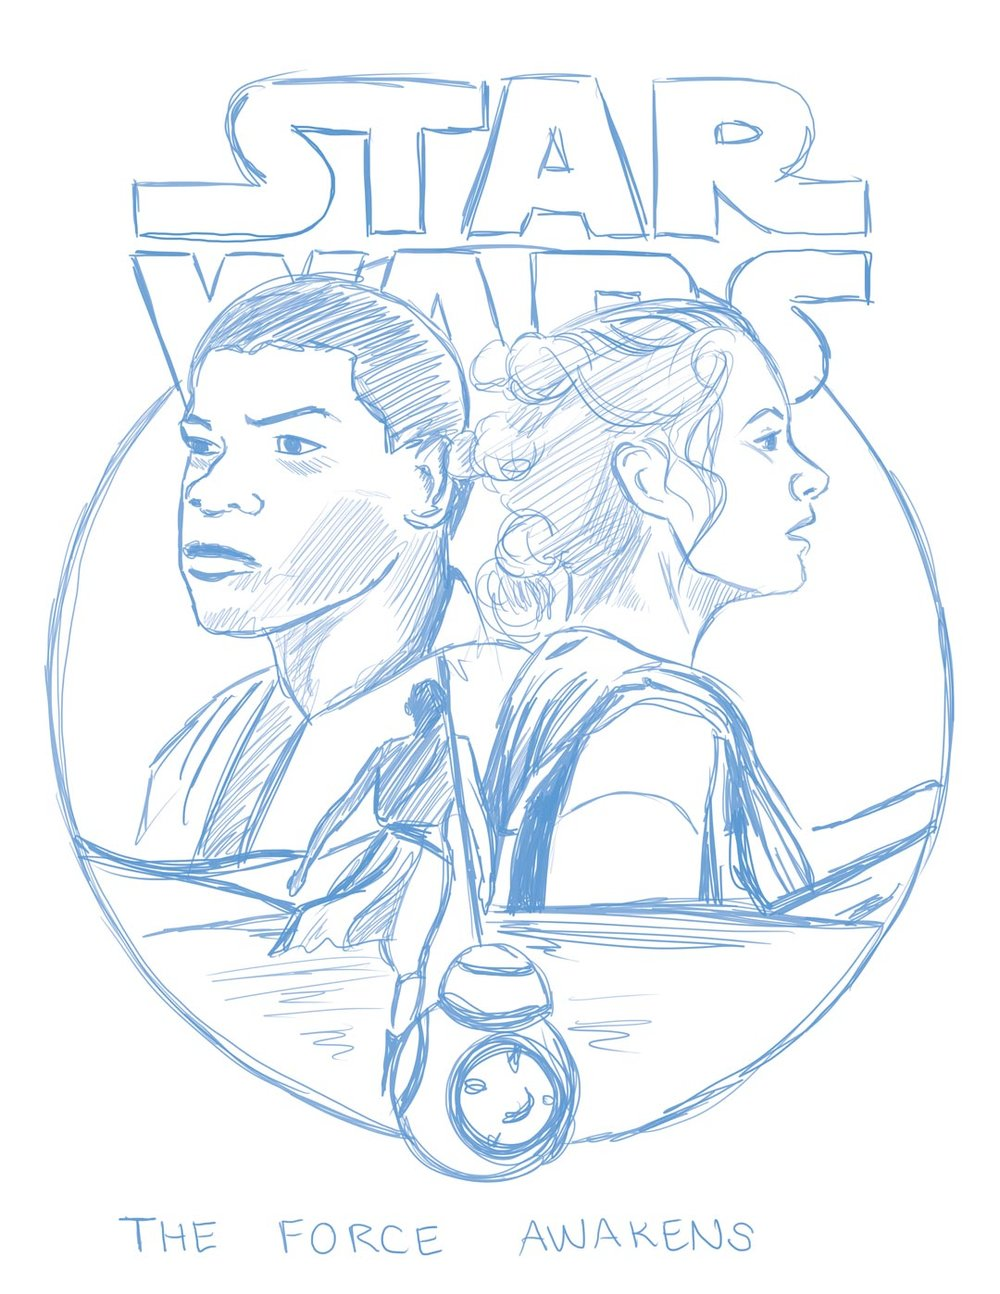 The-Force-Awakens-Sketch.jpg